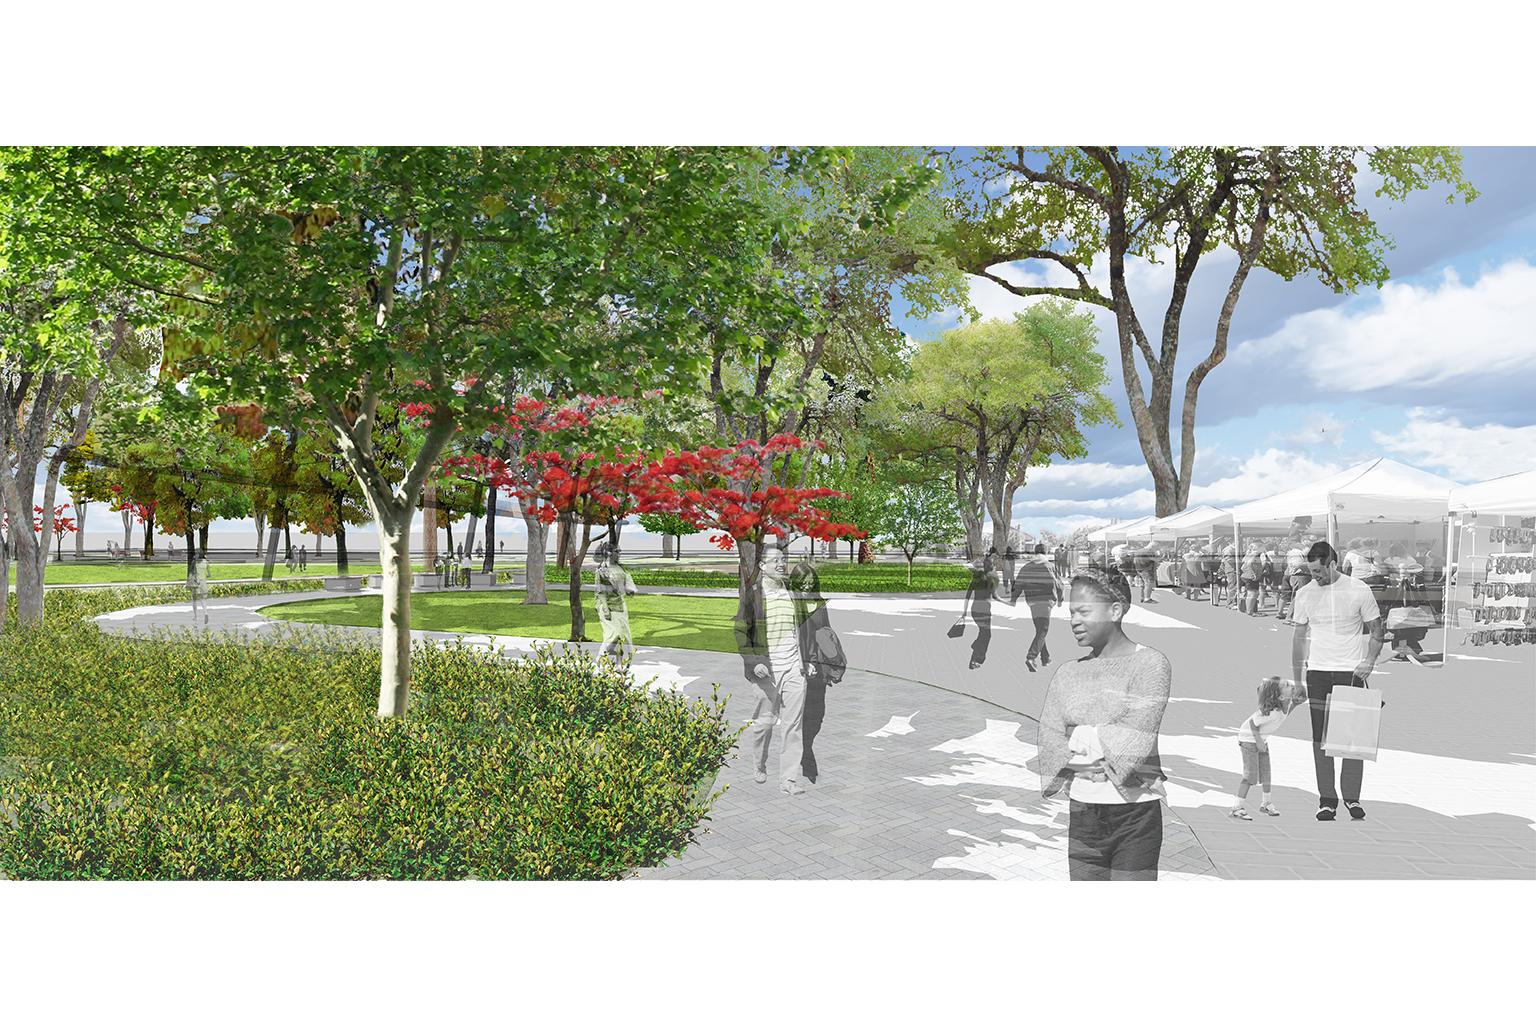 Hayward's Historic Plaza and Arboretum